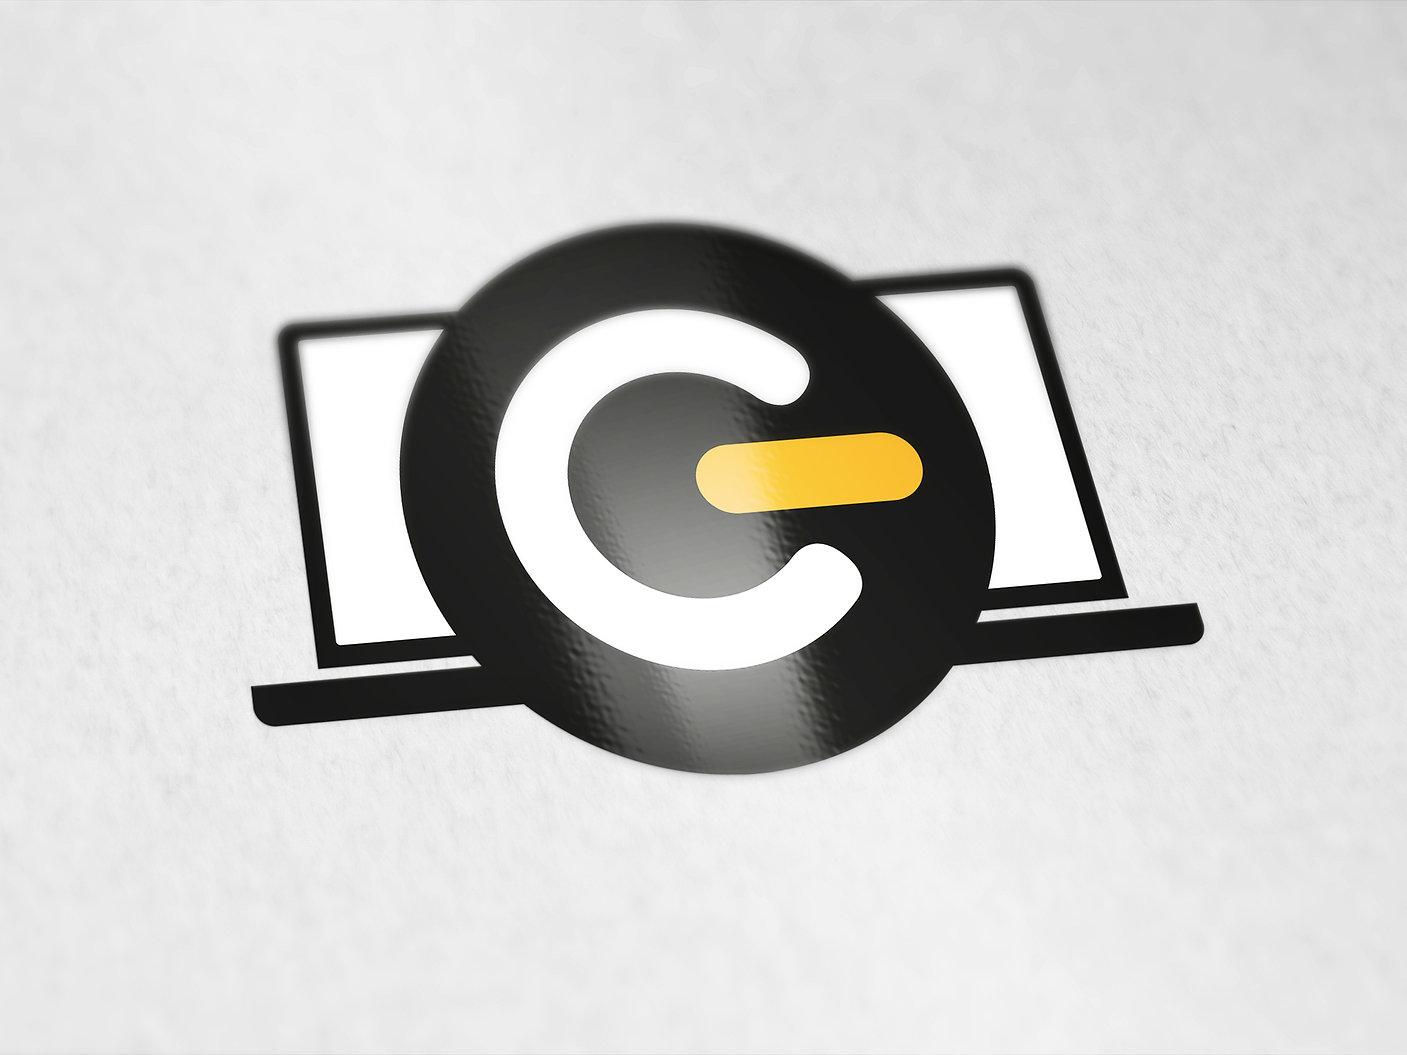 PC Planner-Brand Identity